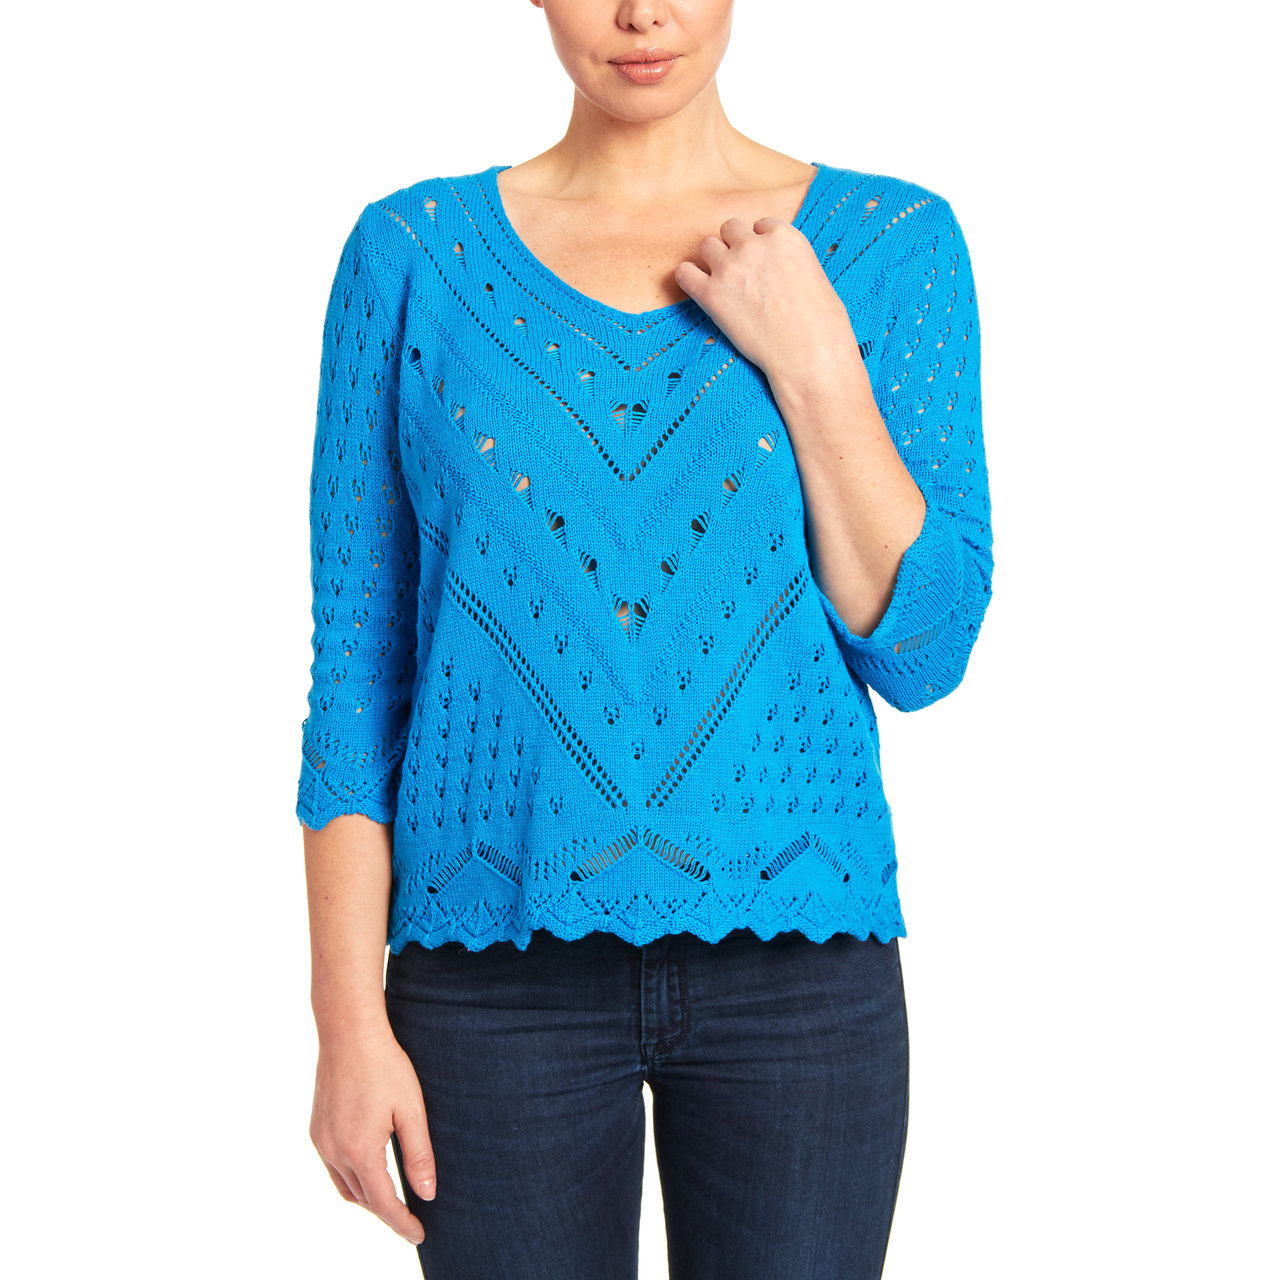 V-neck Open Stitch Knit Sweater in Santorini